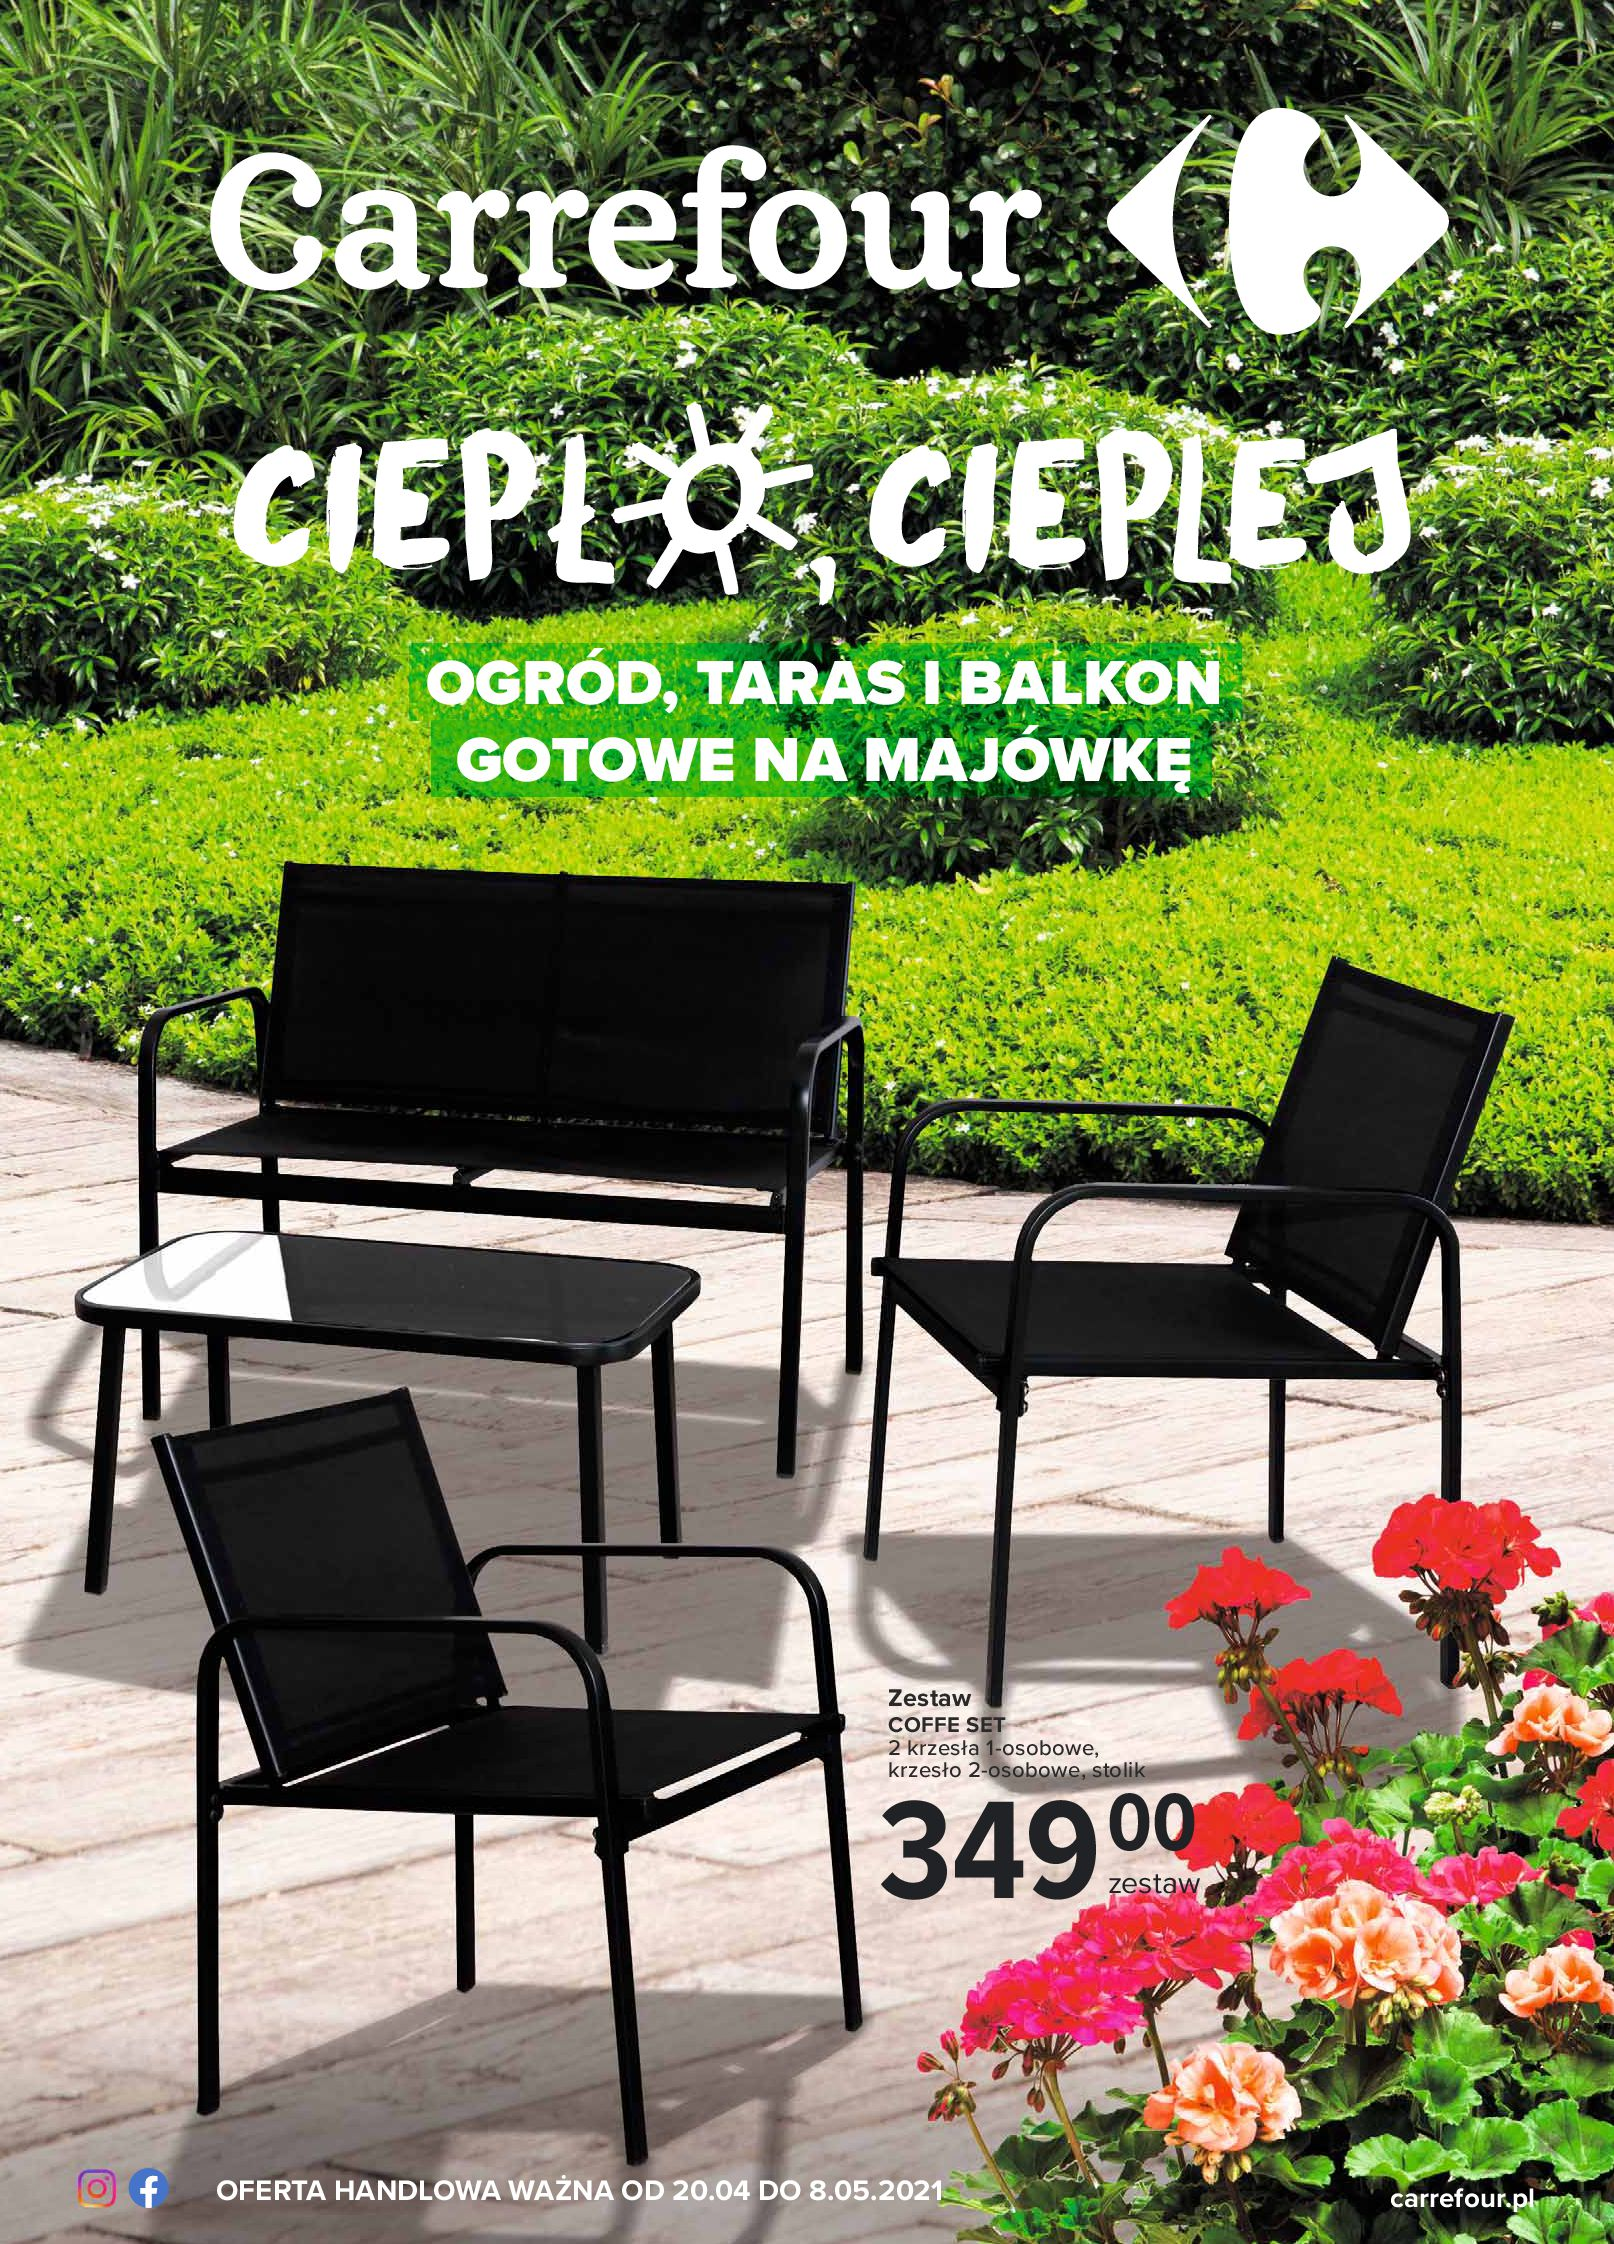 Carrefour:  Gazetka  - Ogród, taras i balkon 19.04.2021